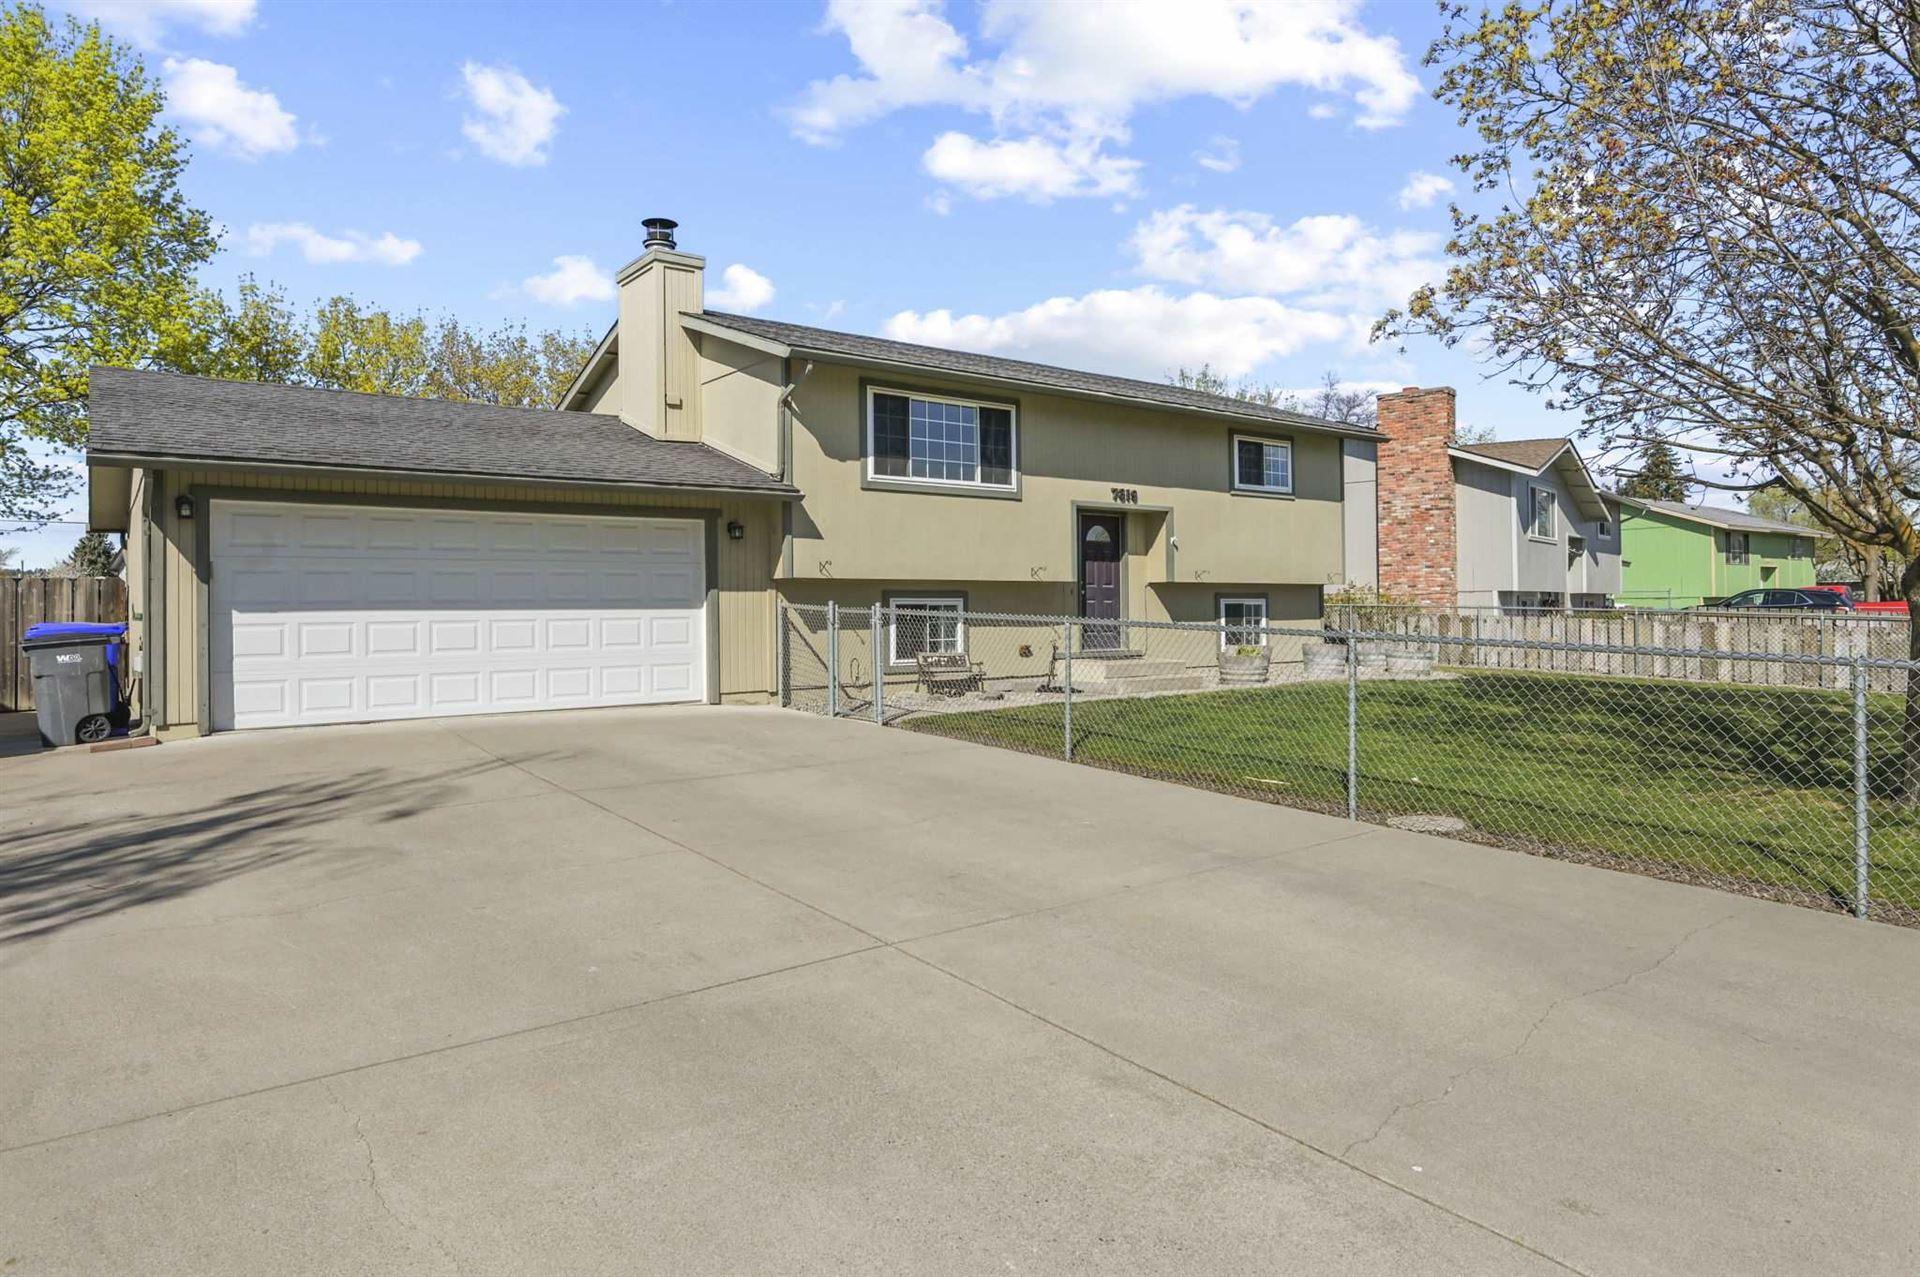 7819 E Augusta Ave, Spokane Valley, WA 99212 - #: 202114441